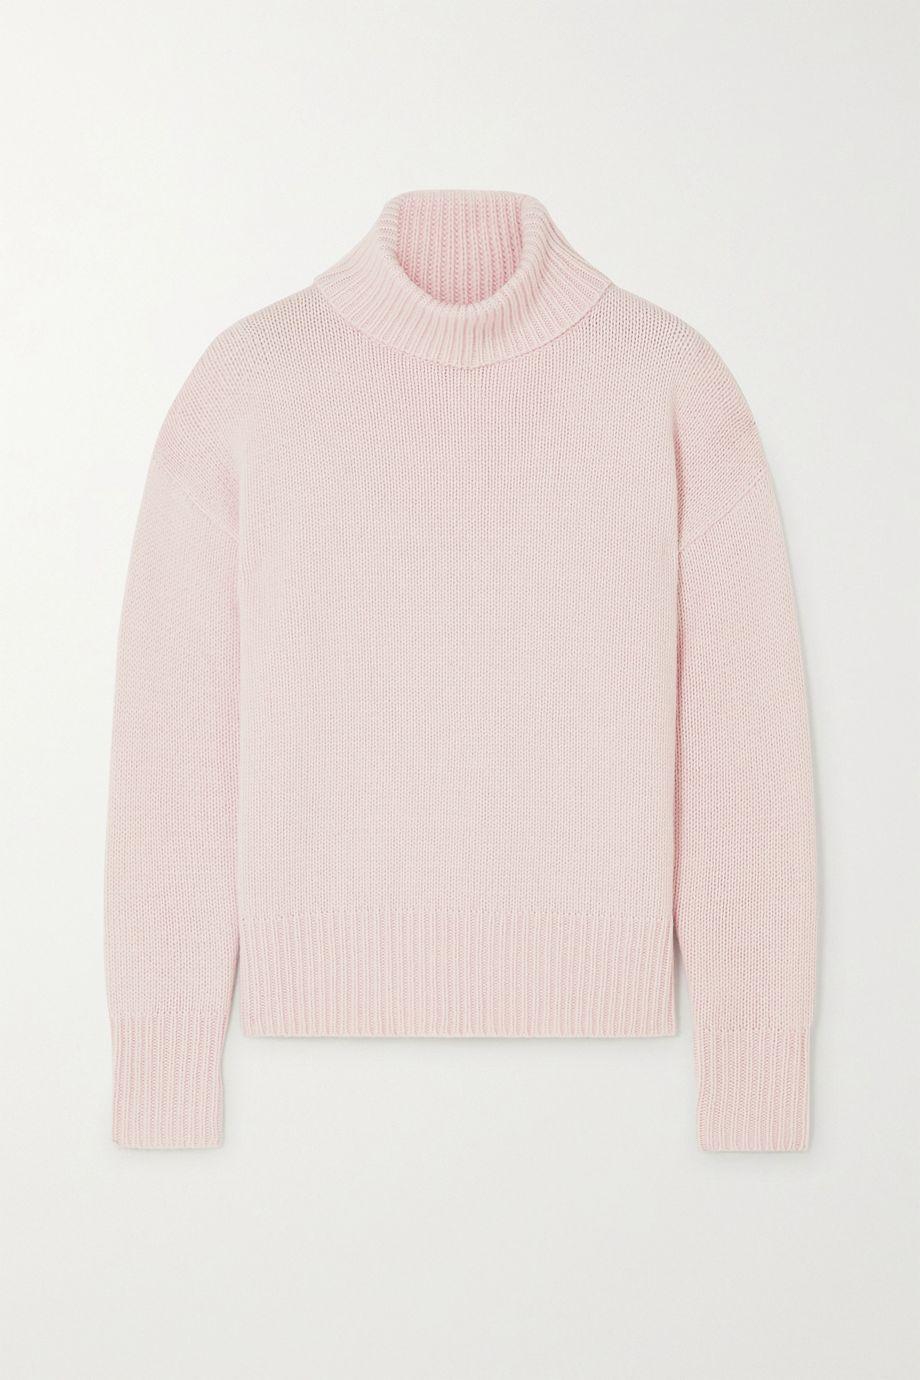 Rebecca Vallance Estate merino wool-blend turtleneck sweater